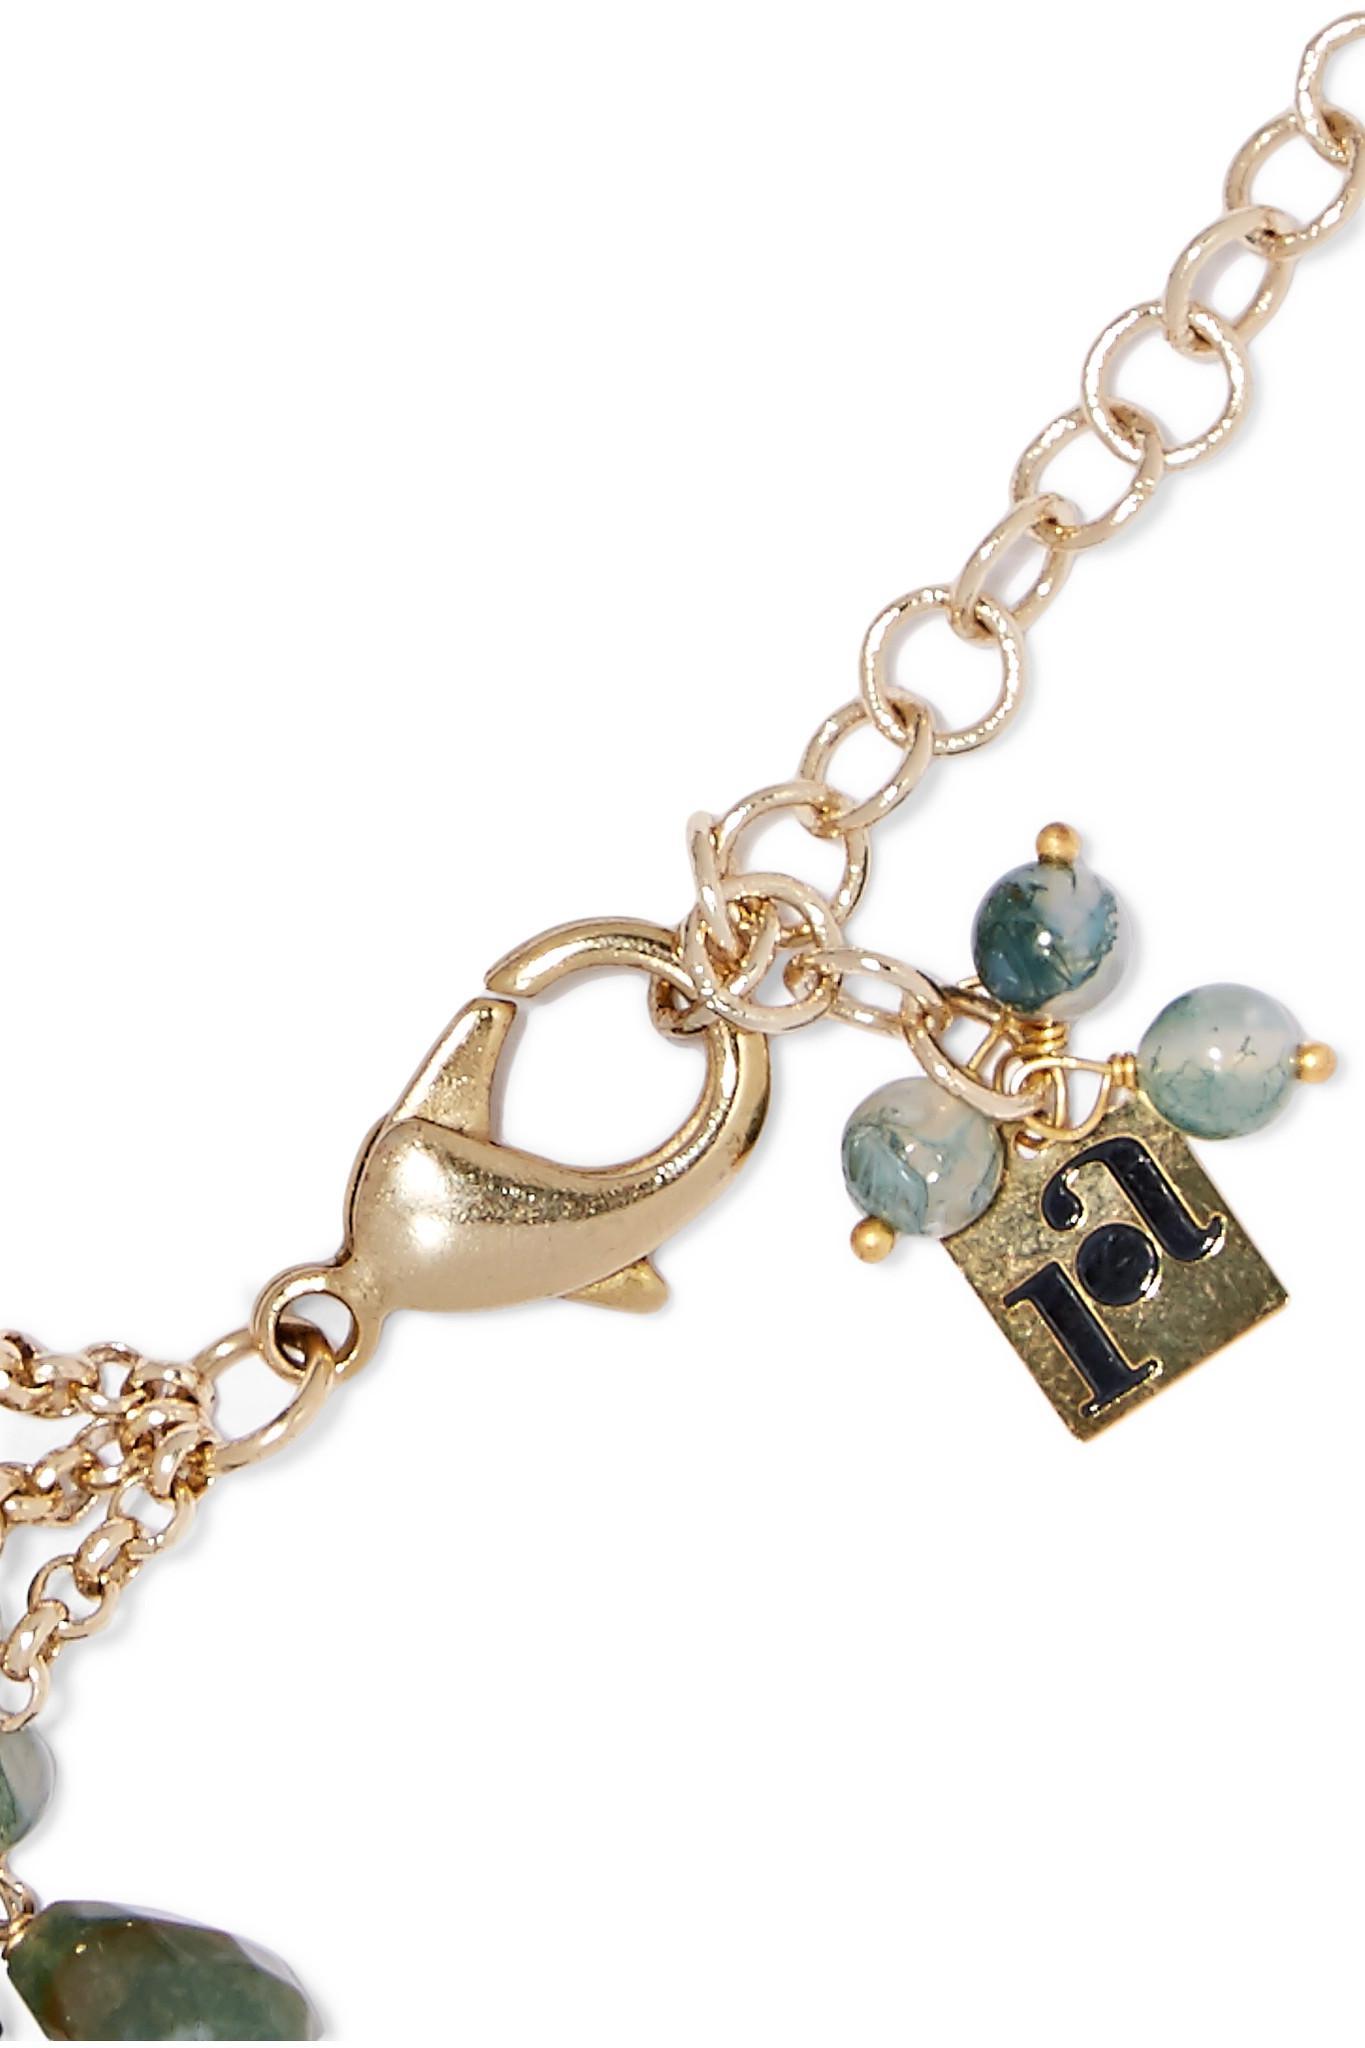 Rifugio Gold-tone Agate Necklace - Green Rosantica kr0JENB